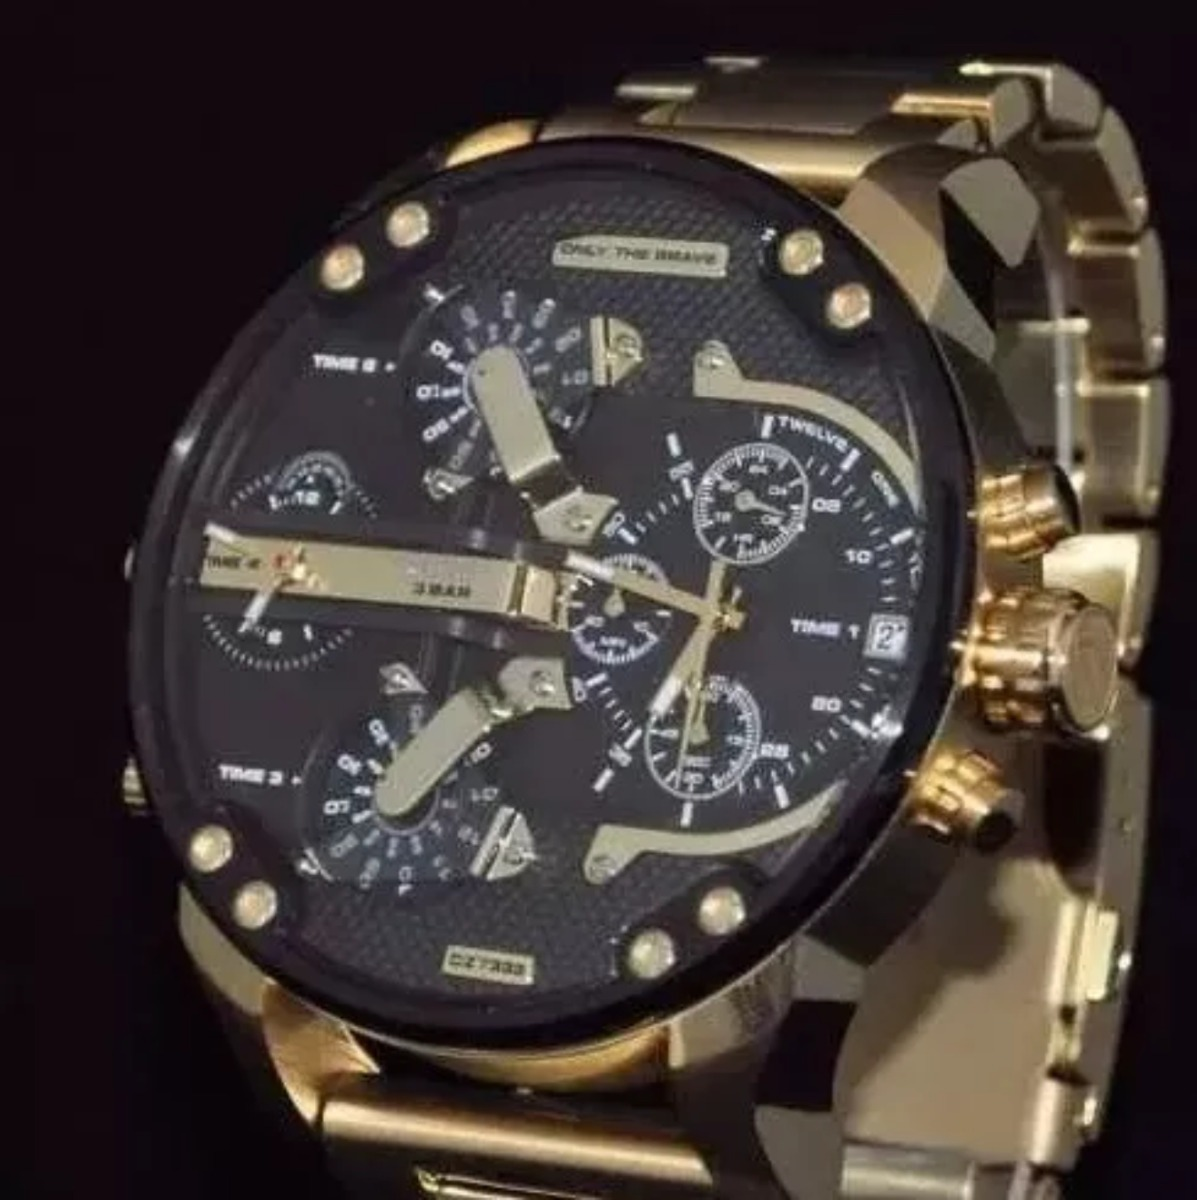 a0fa606ca9f7 Reloj Diesel Bañado En Oro Only The Brave Dz 7333 A517 -   7.000